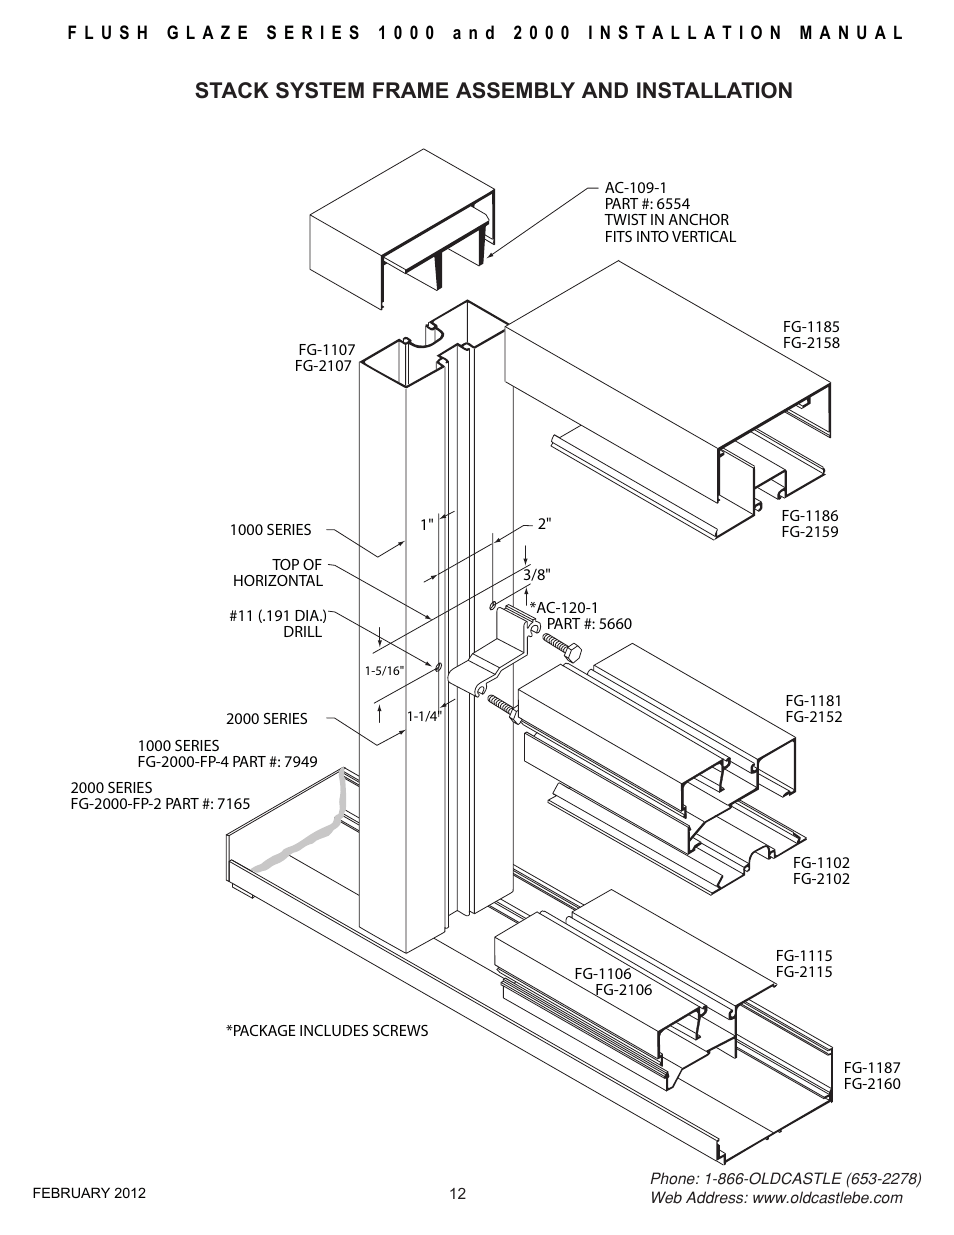 Stack-frame-assy, Stack system frame assembly and